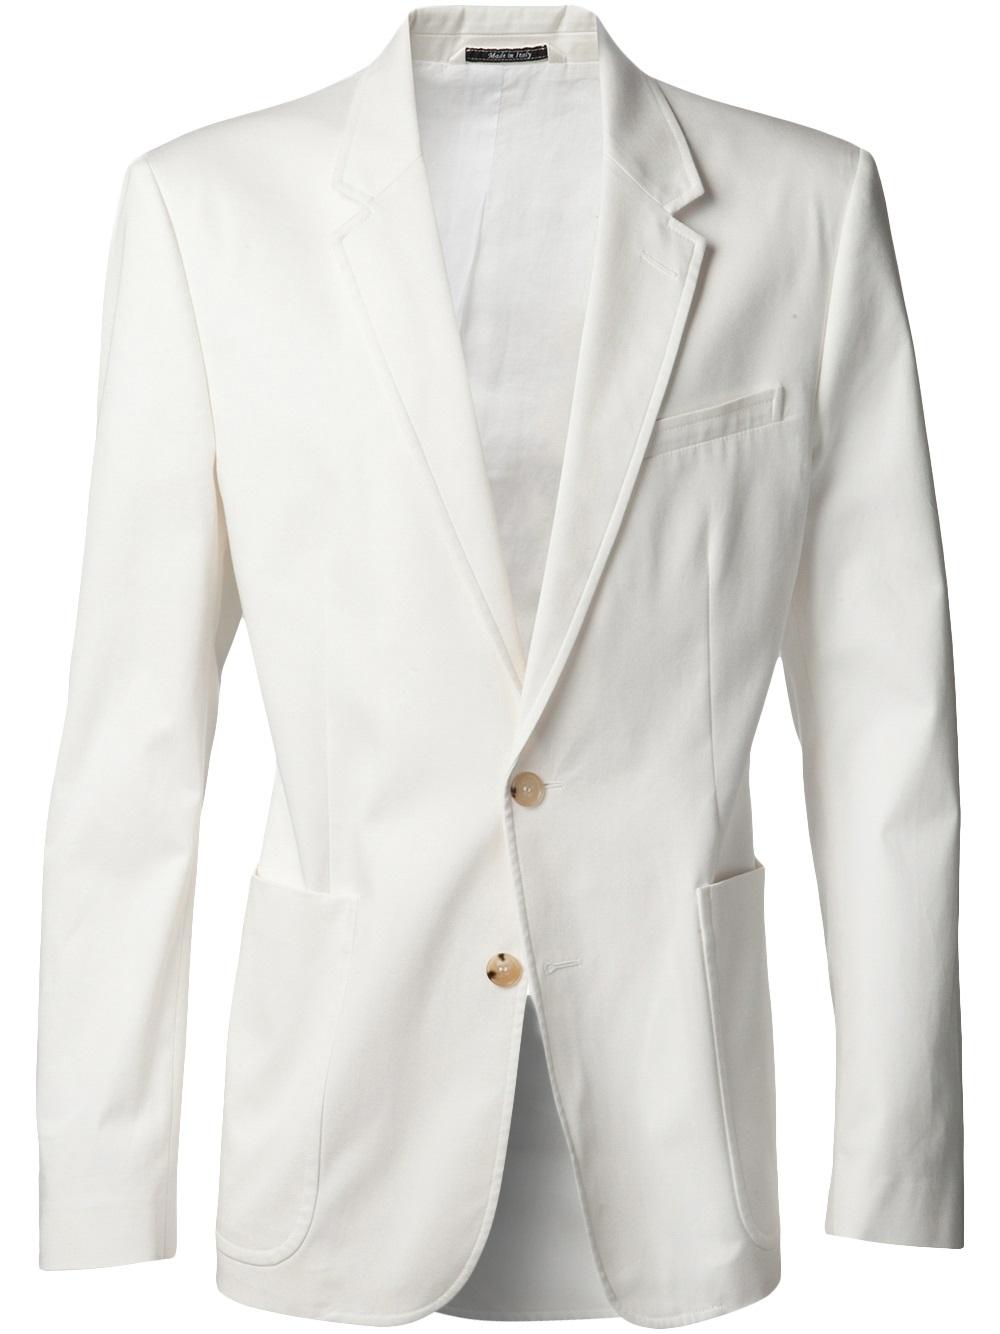 White Blazer Jacket | Fashion Ql